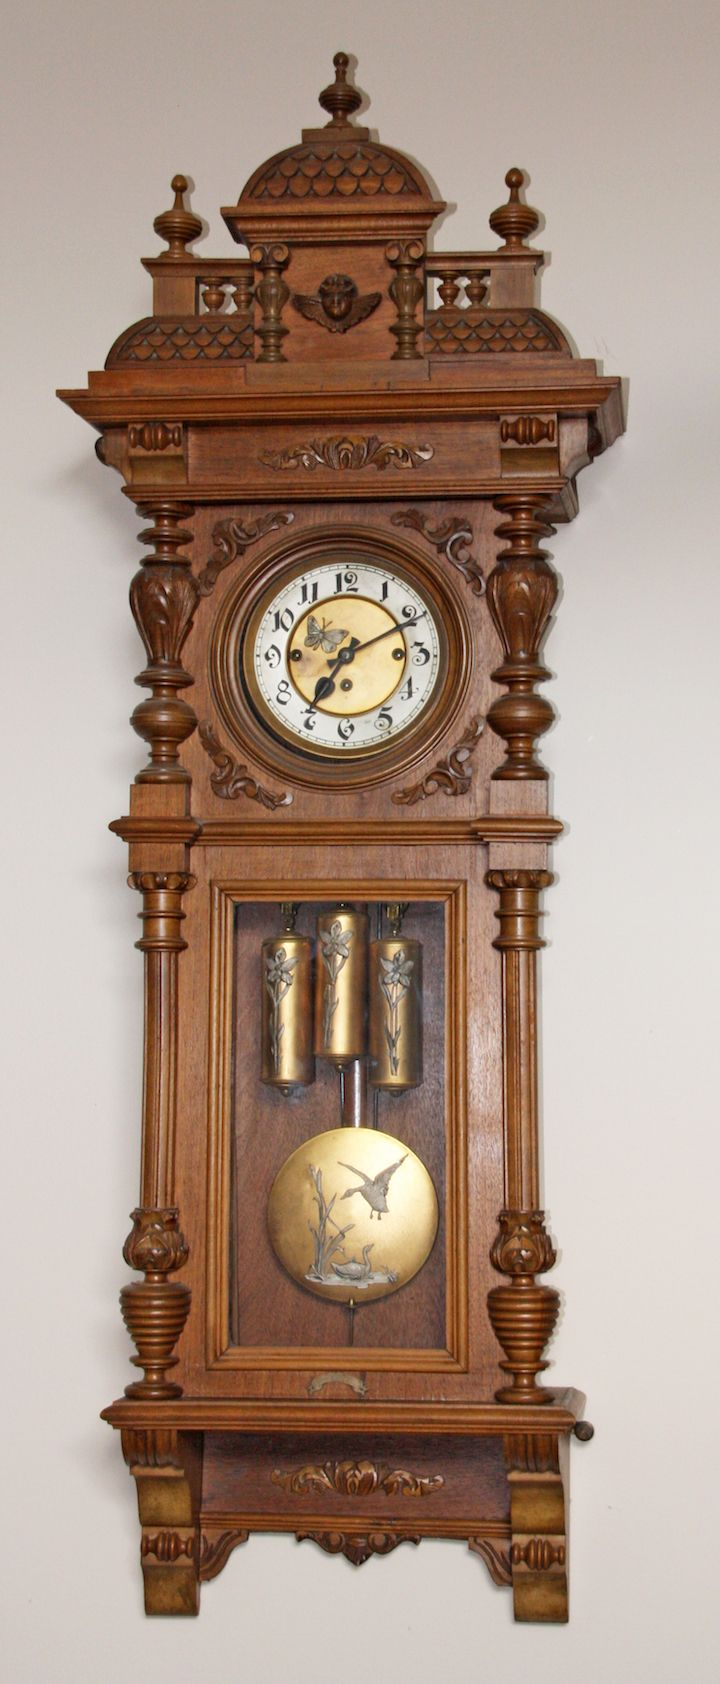 George S Antique Clocks Vintage Clock Antique Clocks For Sale Antique Wall Clock